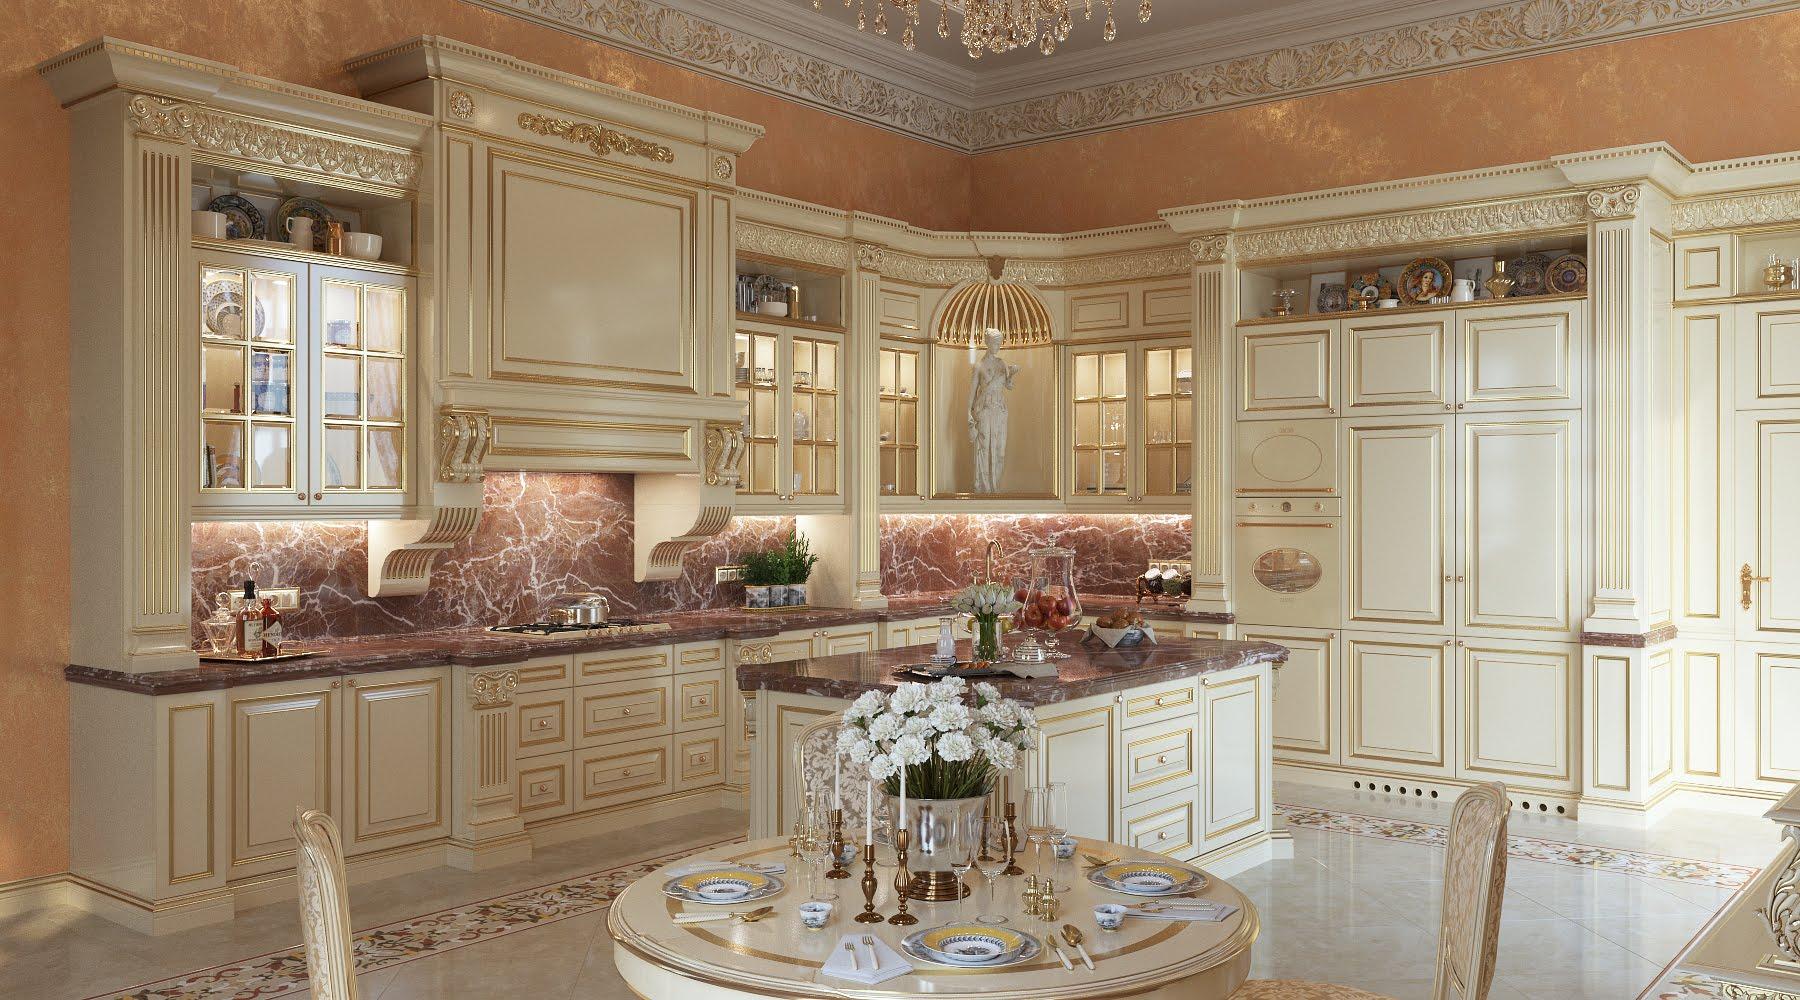 кухни с витринами в классическом стиле фото кустарники для дачи